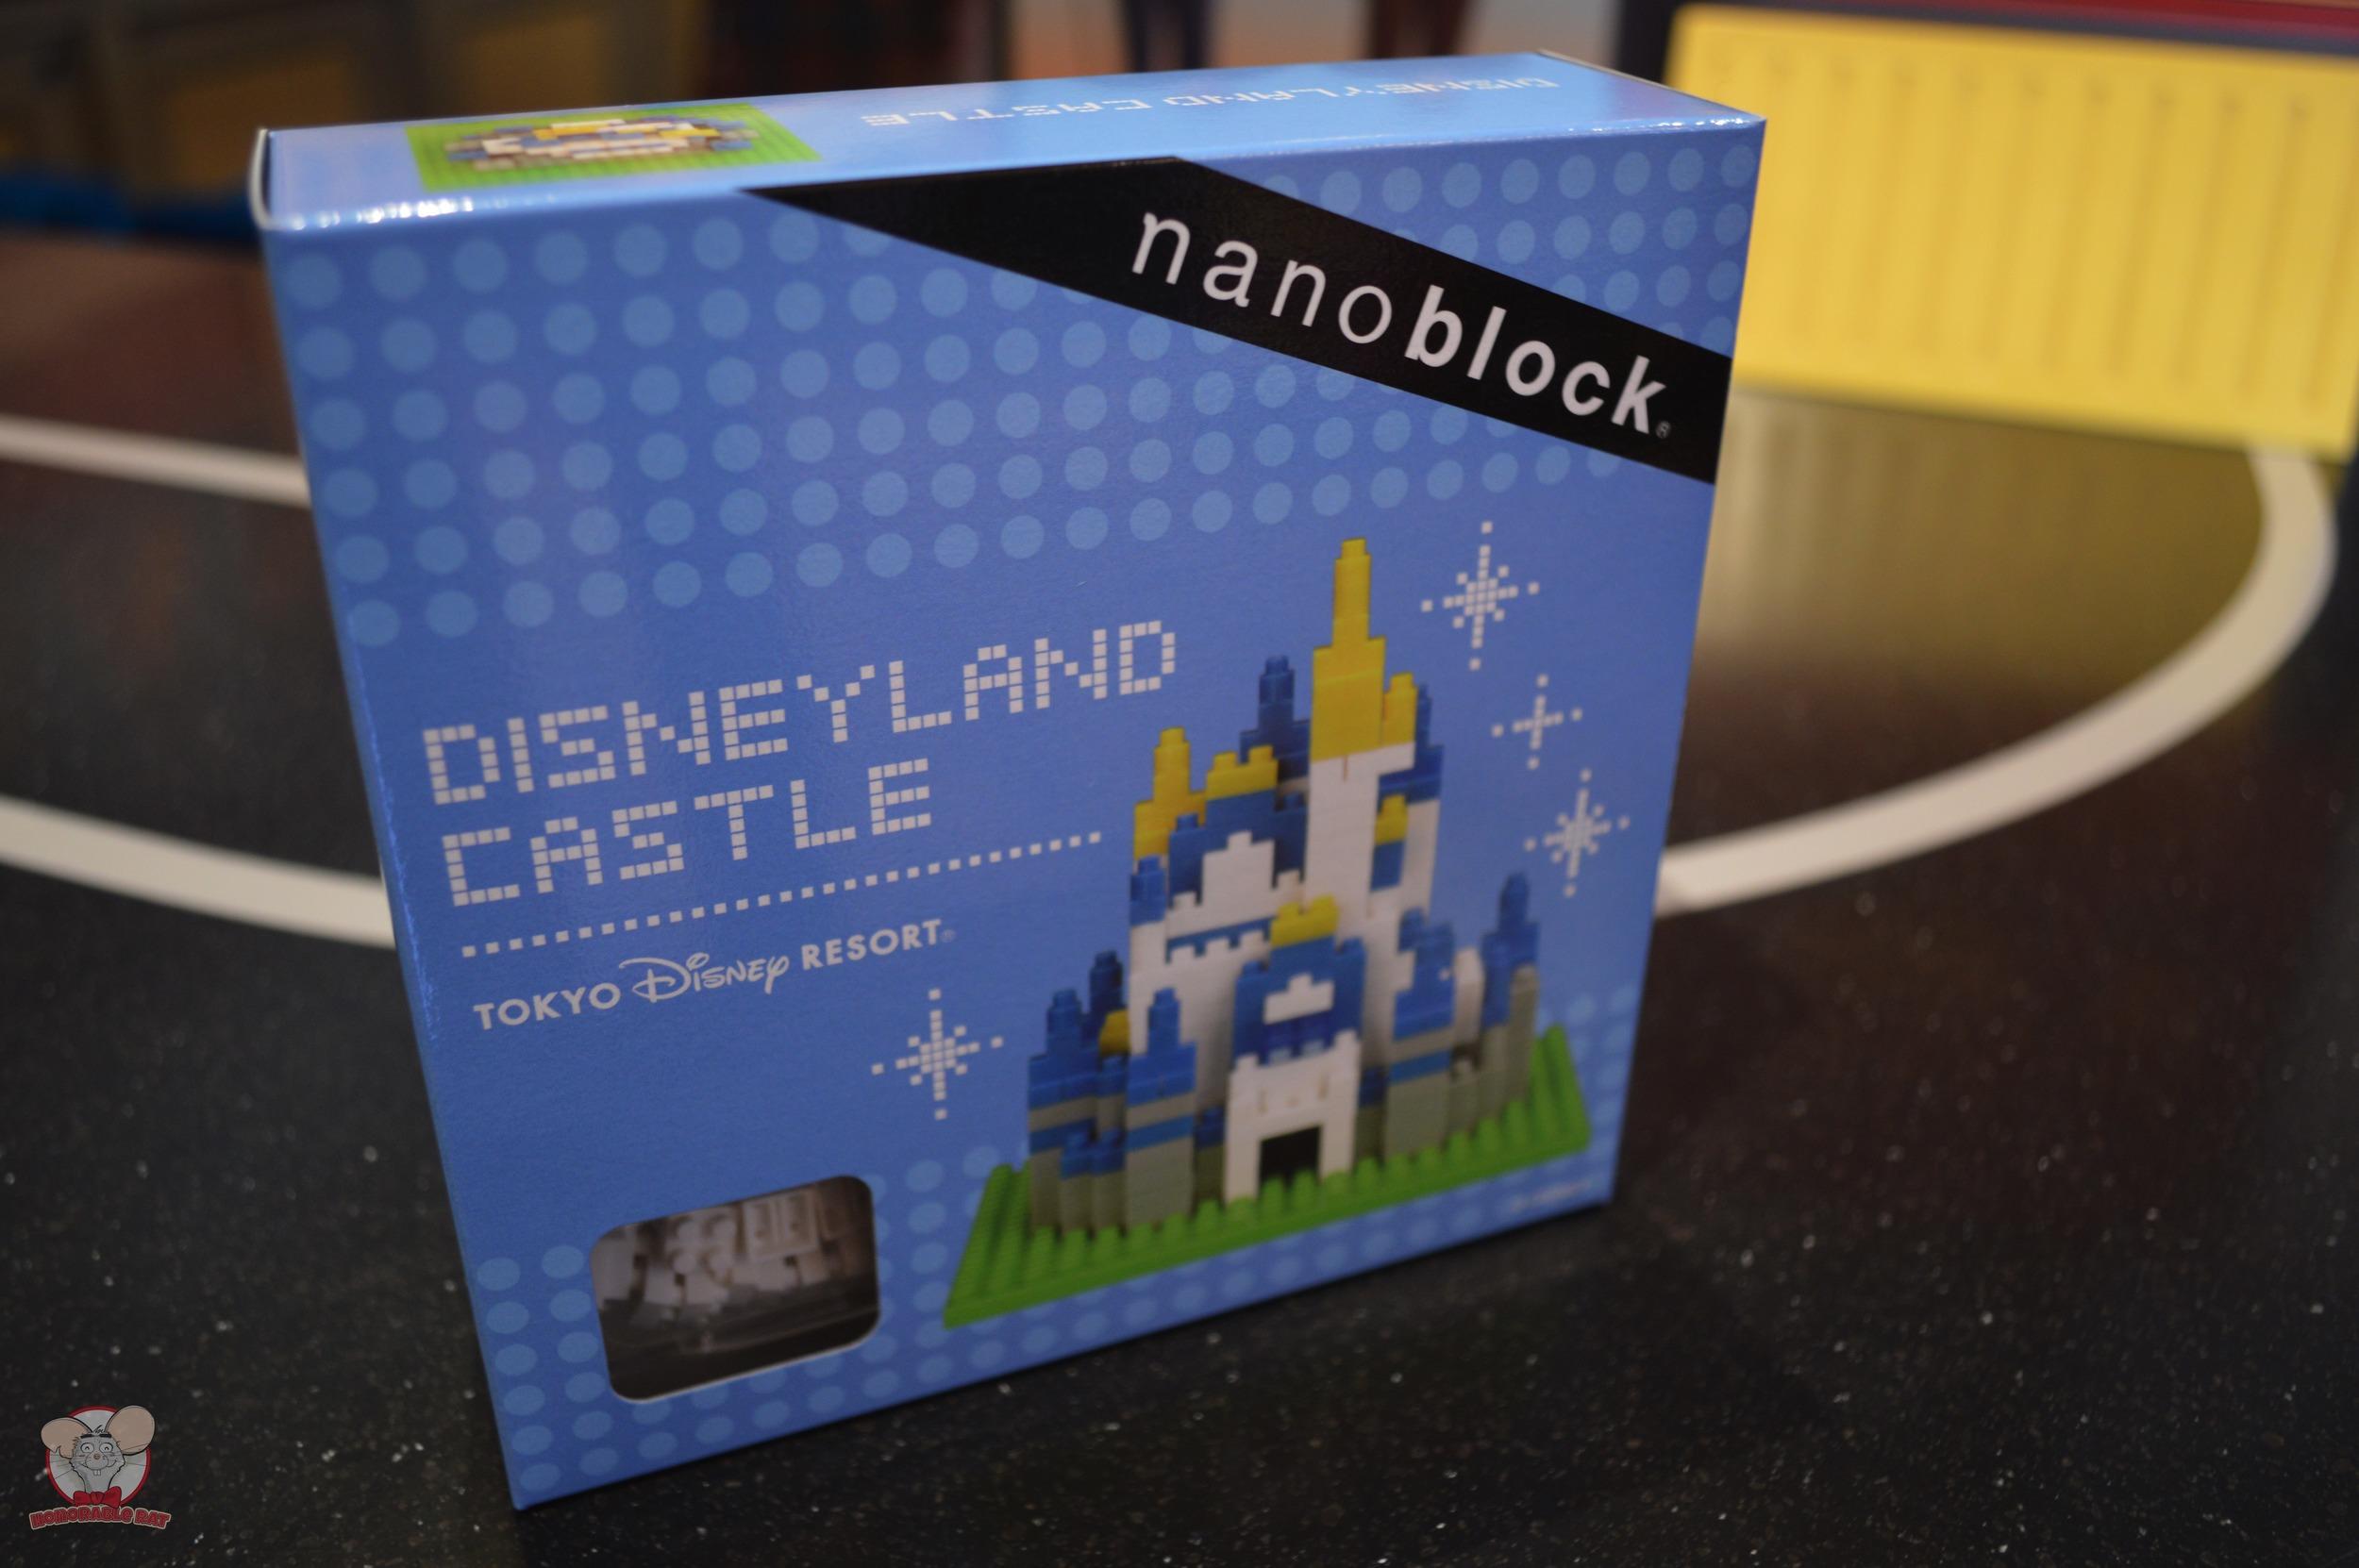 Disneyland Castle Nanoblock (Front): 2,200 yen